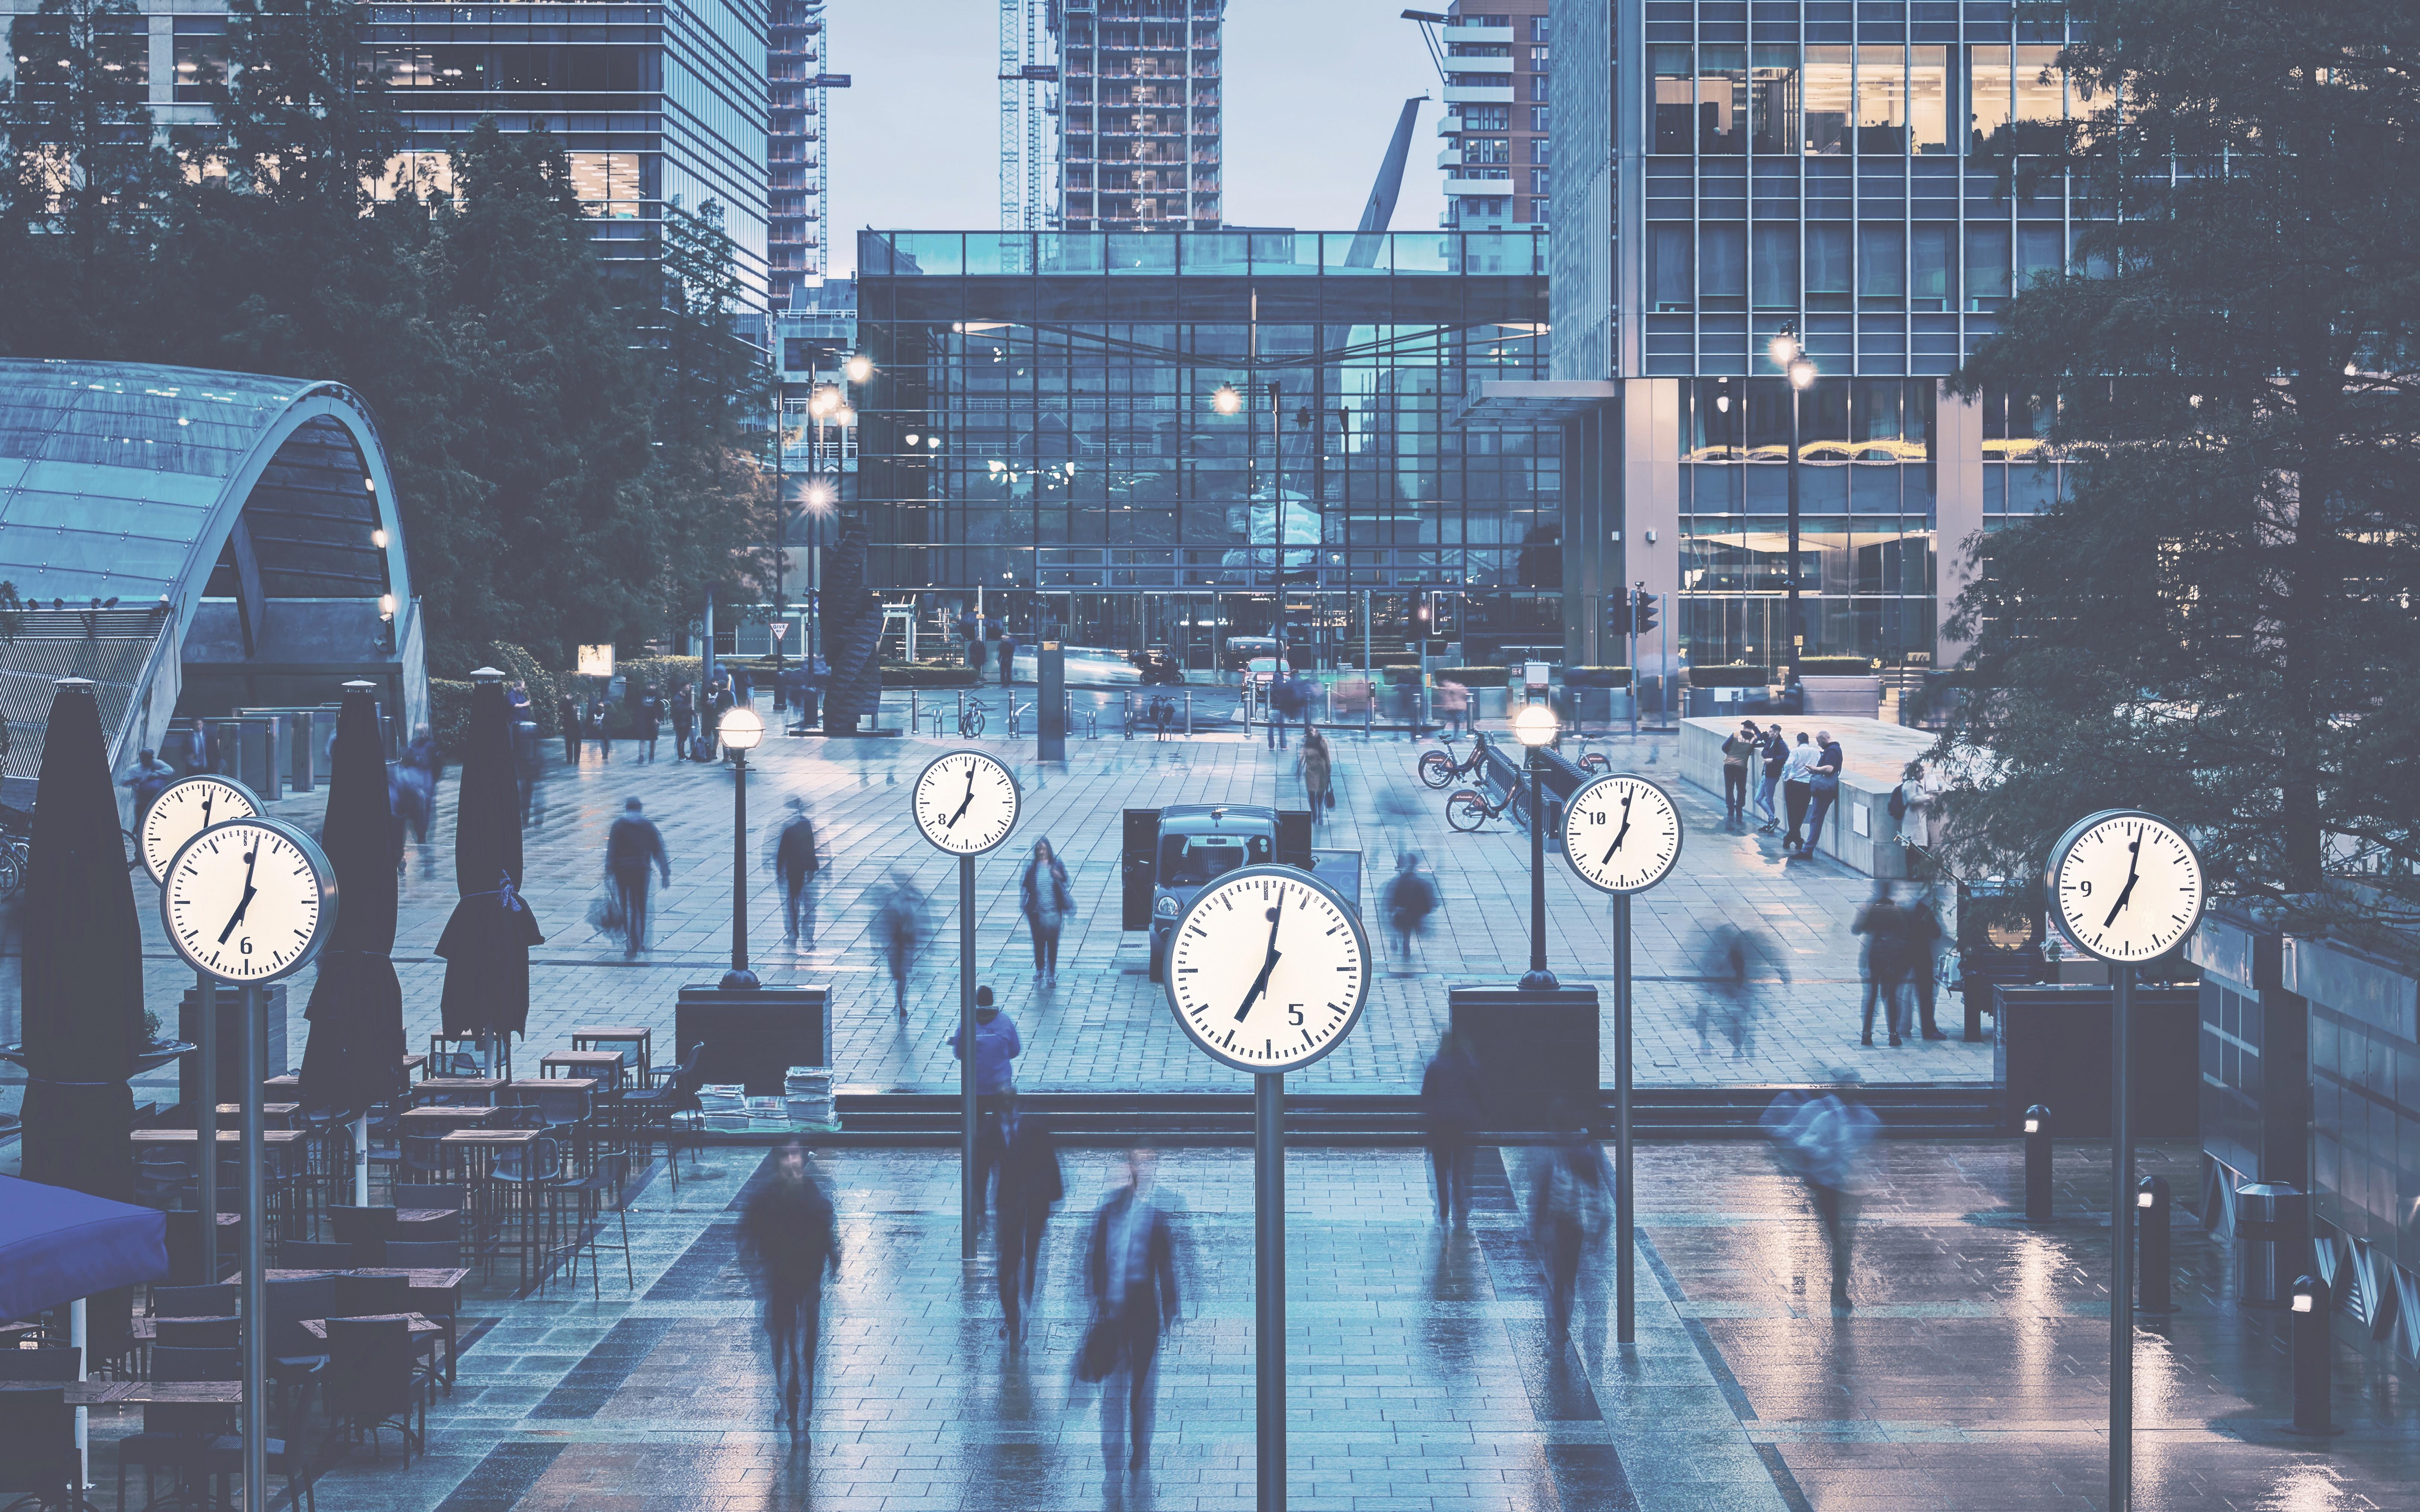 Canary_Wharf_Clocks_Cool_Sharp (IP)